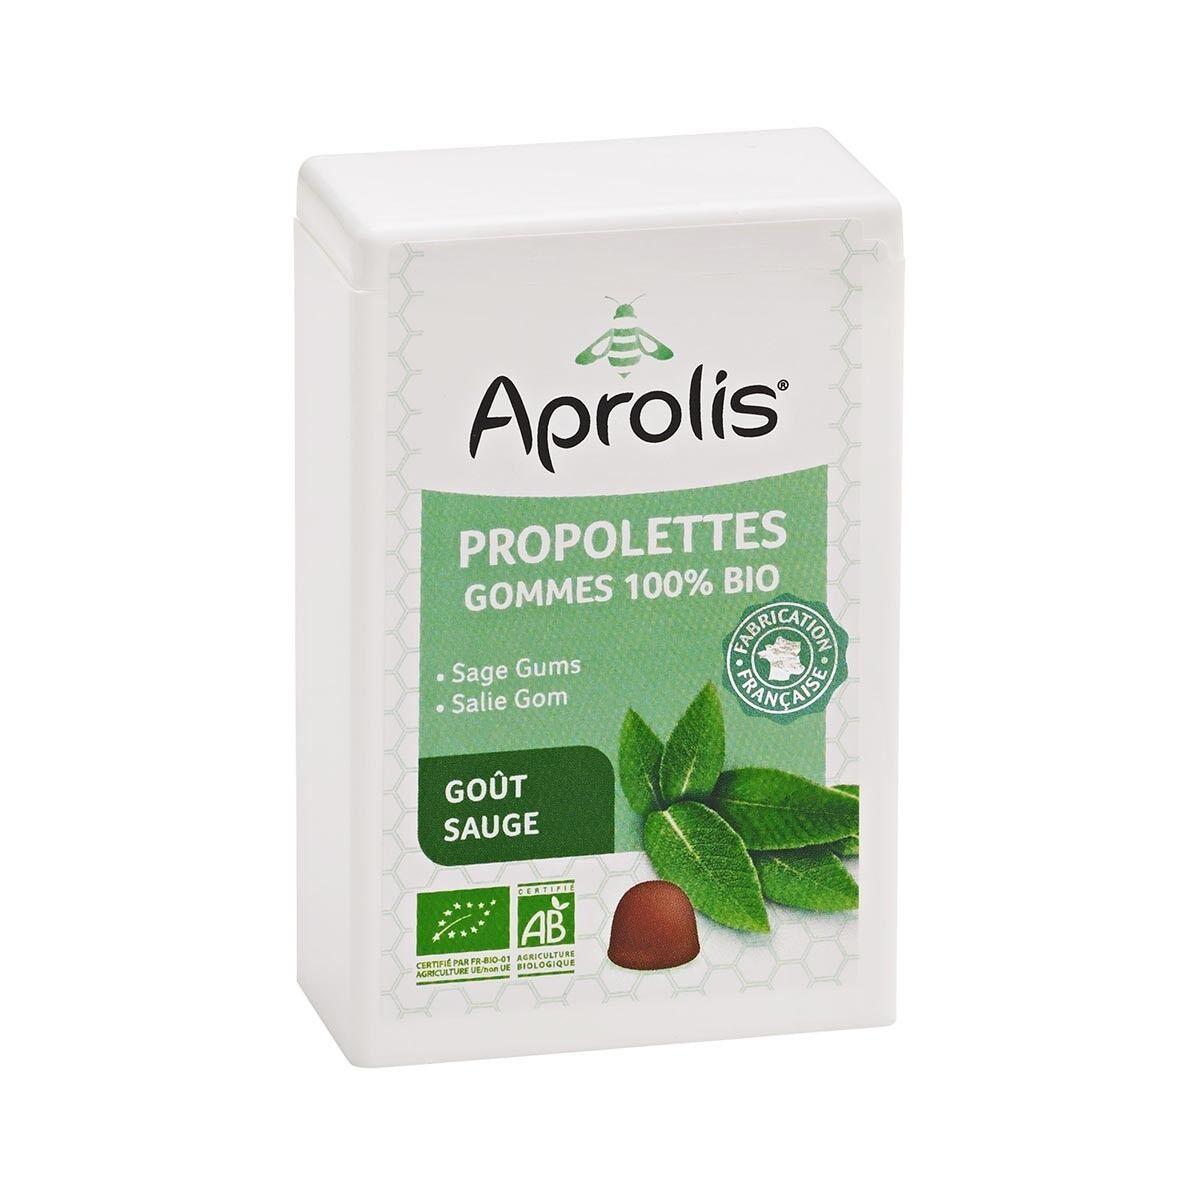 APROLIS Propolettes Sauge 50g Bio - Aprolis